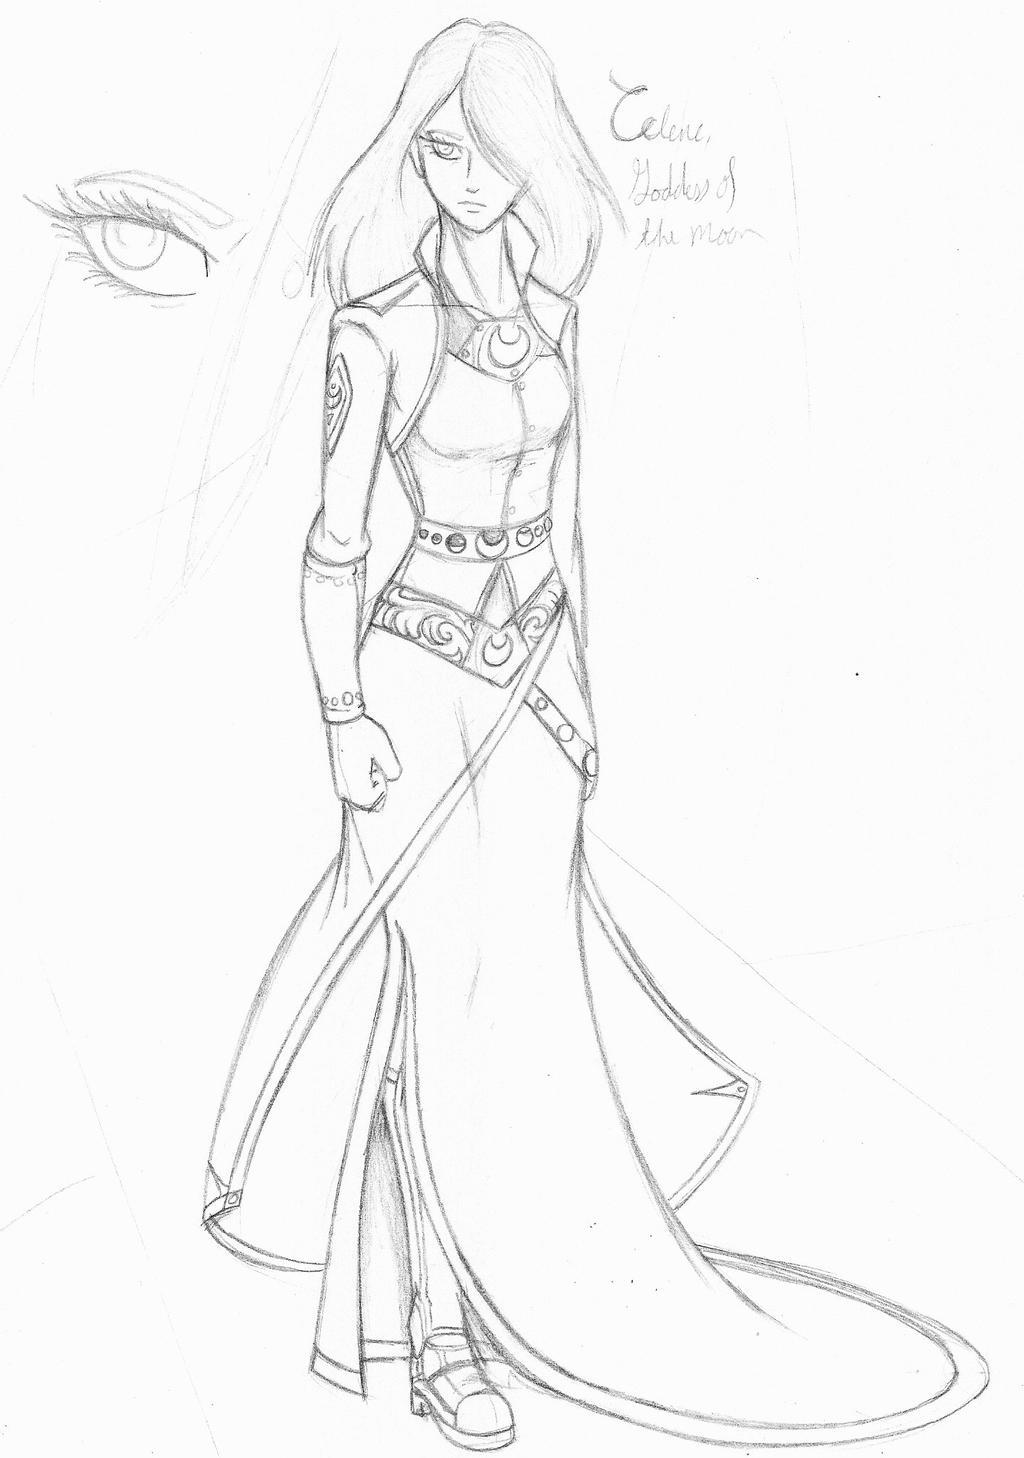 Queen Celene - Formal Attire, Part I by CrowDeCorvidae